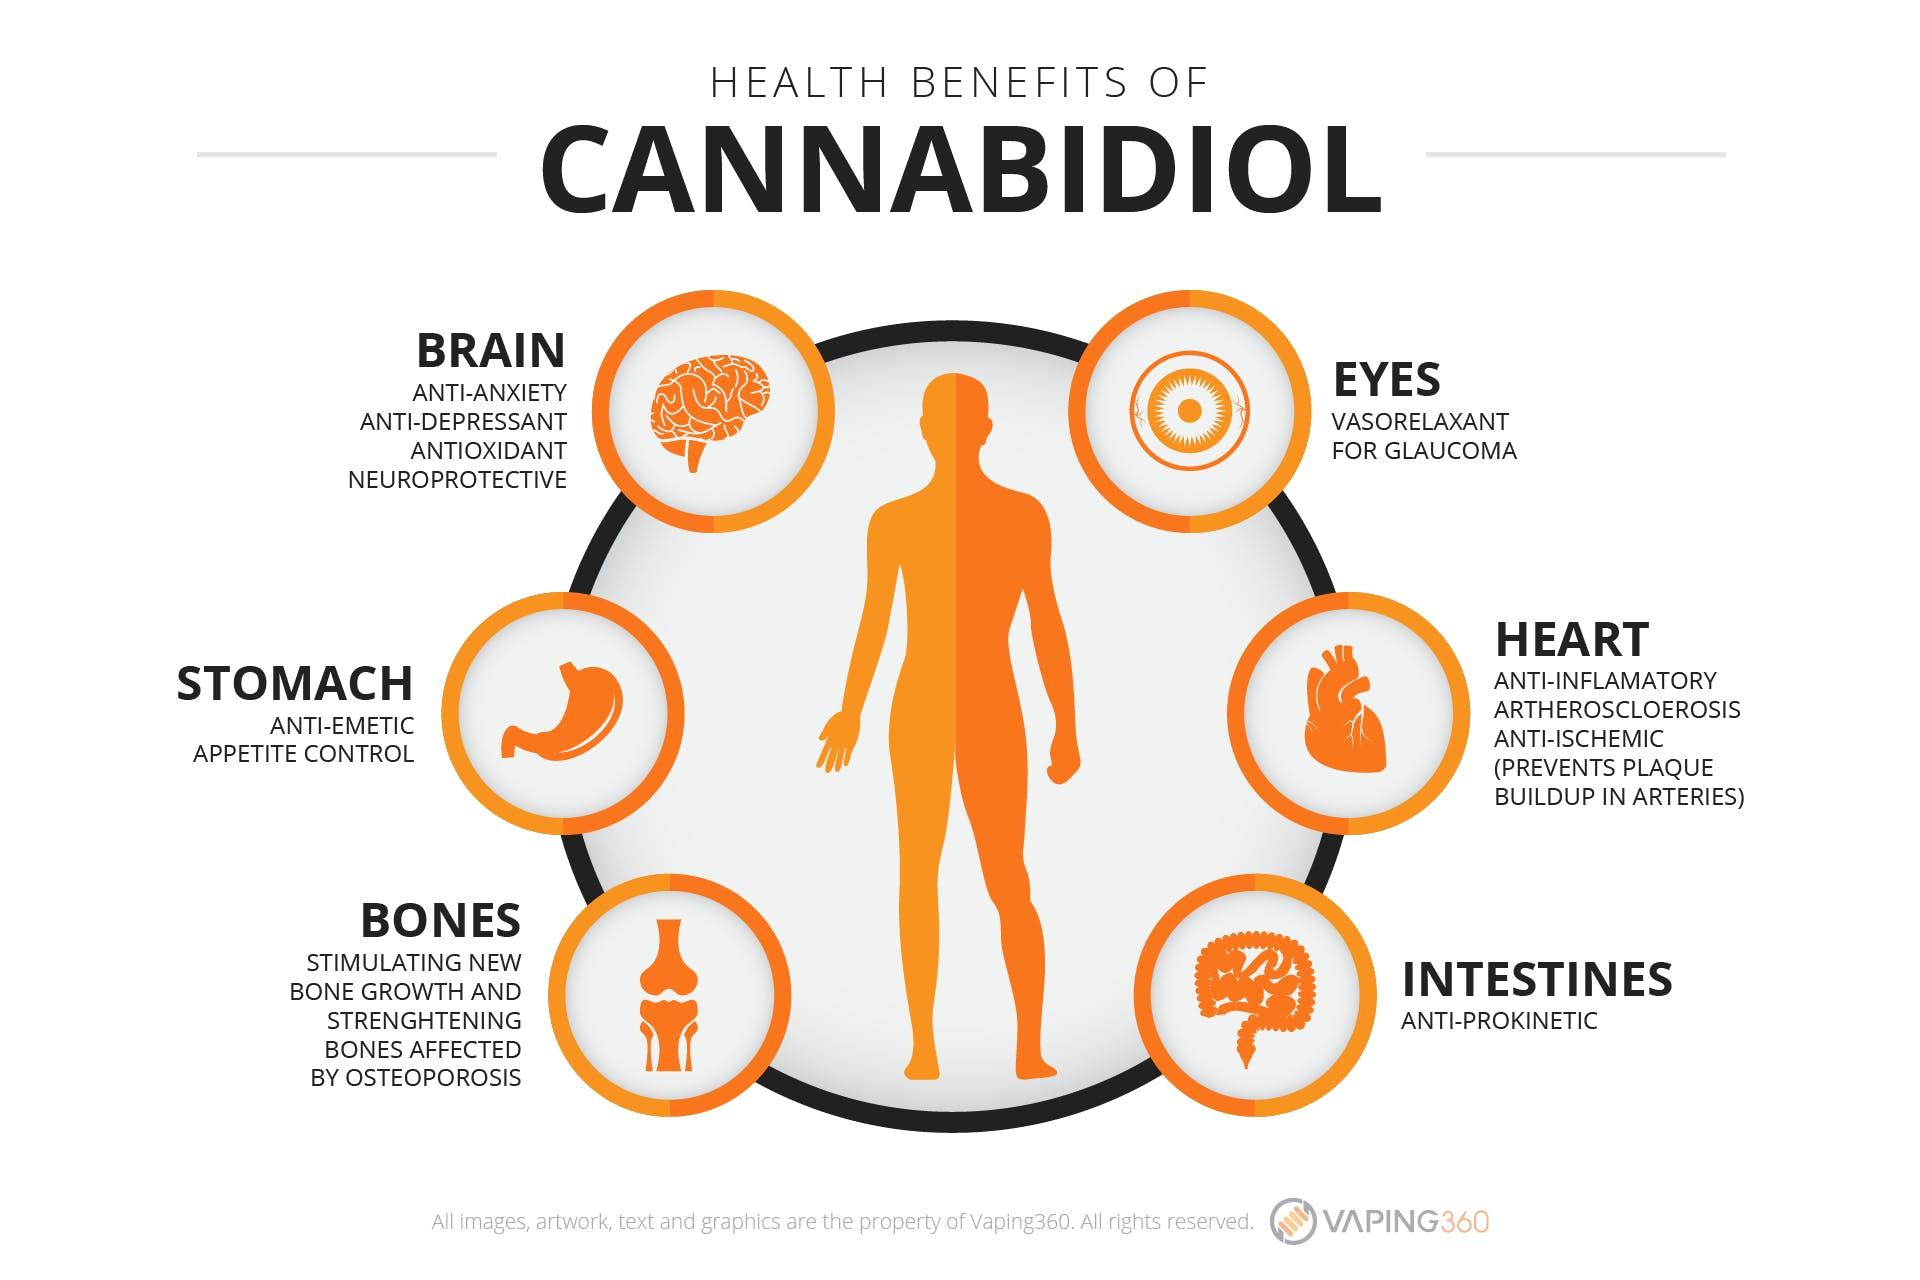 Health Benefits of Cannabidiol-Infographic